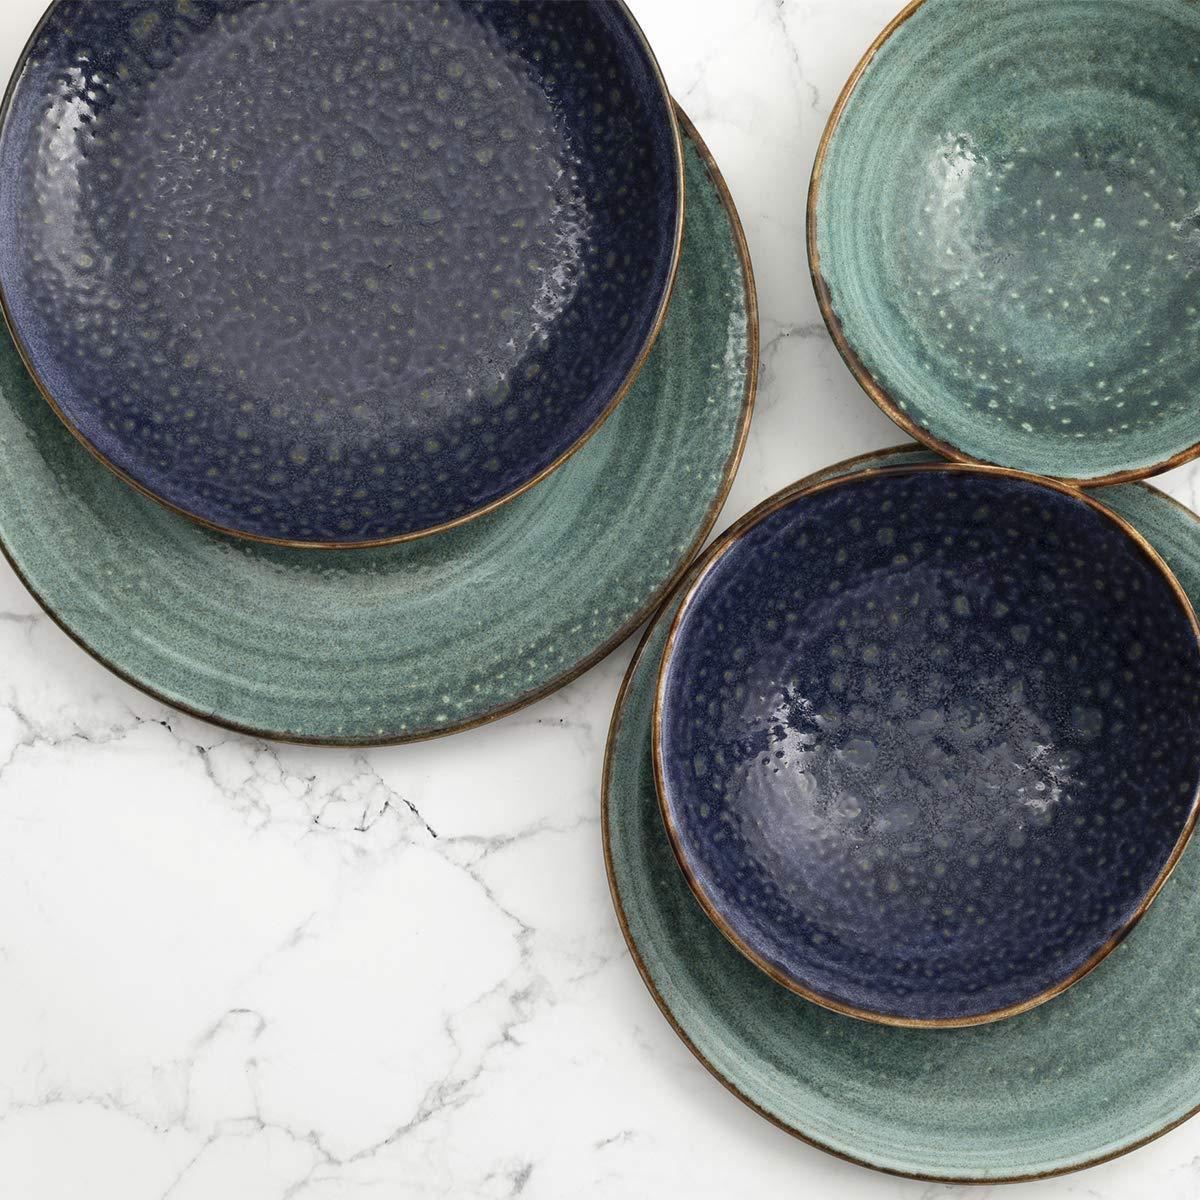 SUMMA Moon Turquoise Plato Llano 25 cm 6 Piezas Porcelana Turquesa